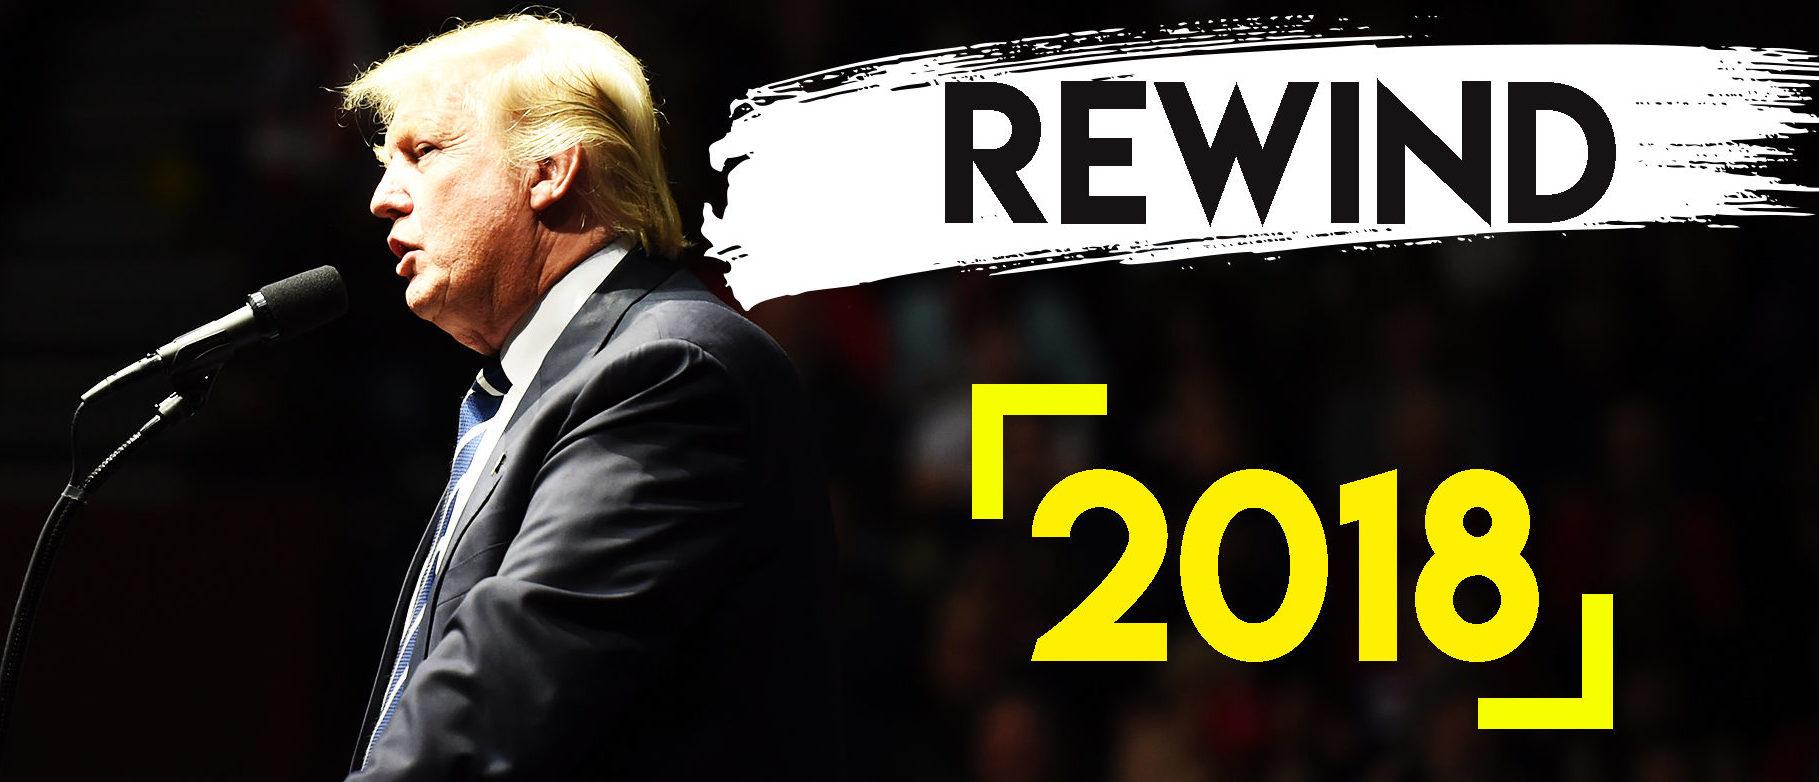 Trump Rewind 2018/Screen Shot/The Daily Caller